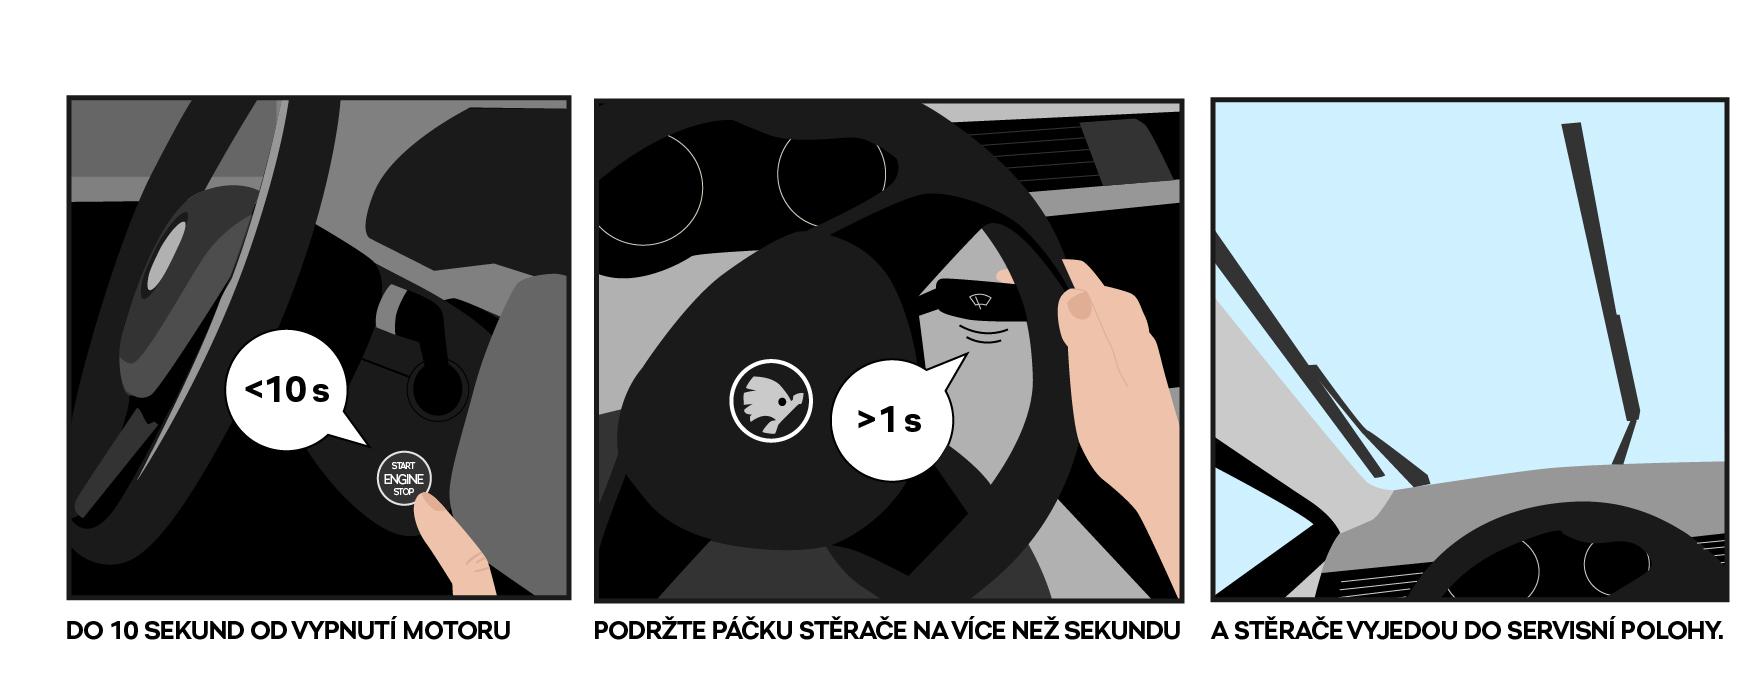 skoda_sterace_4_strip.jpg